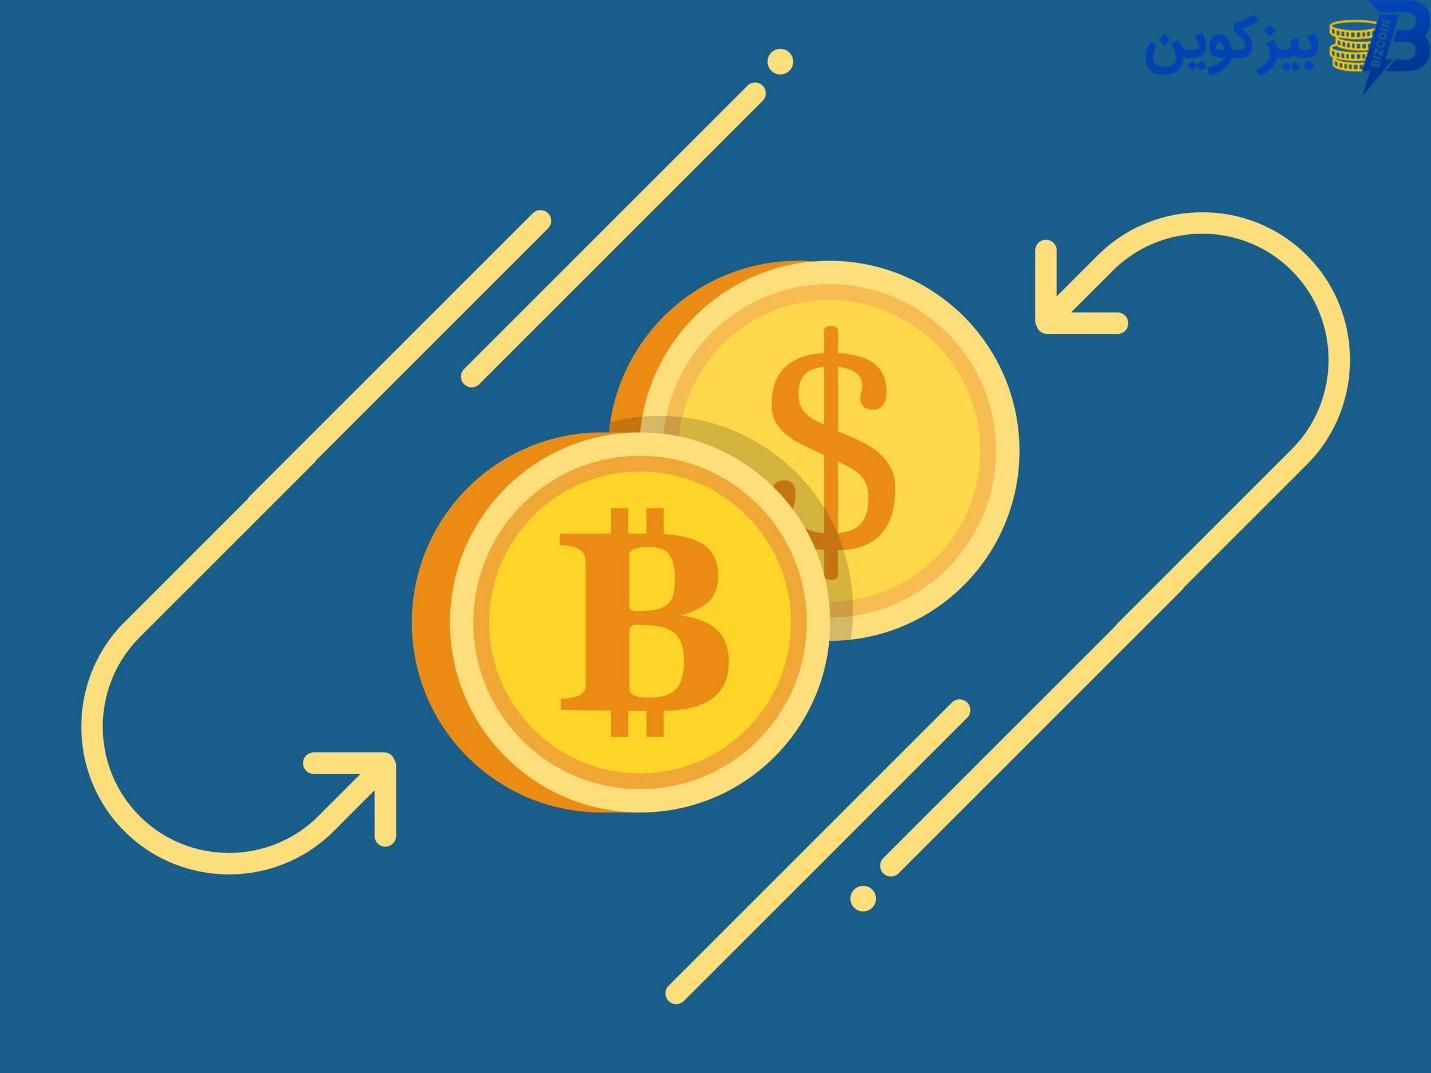 pre sale bitcoin 4 آیا پیش فروش بیت کوین یک دروغ بزرگ است؟